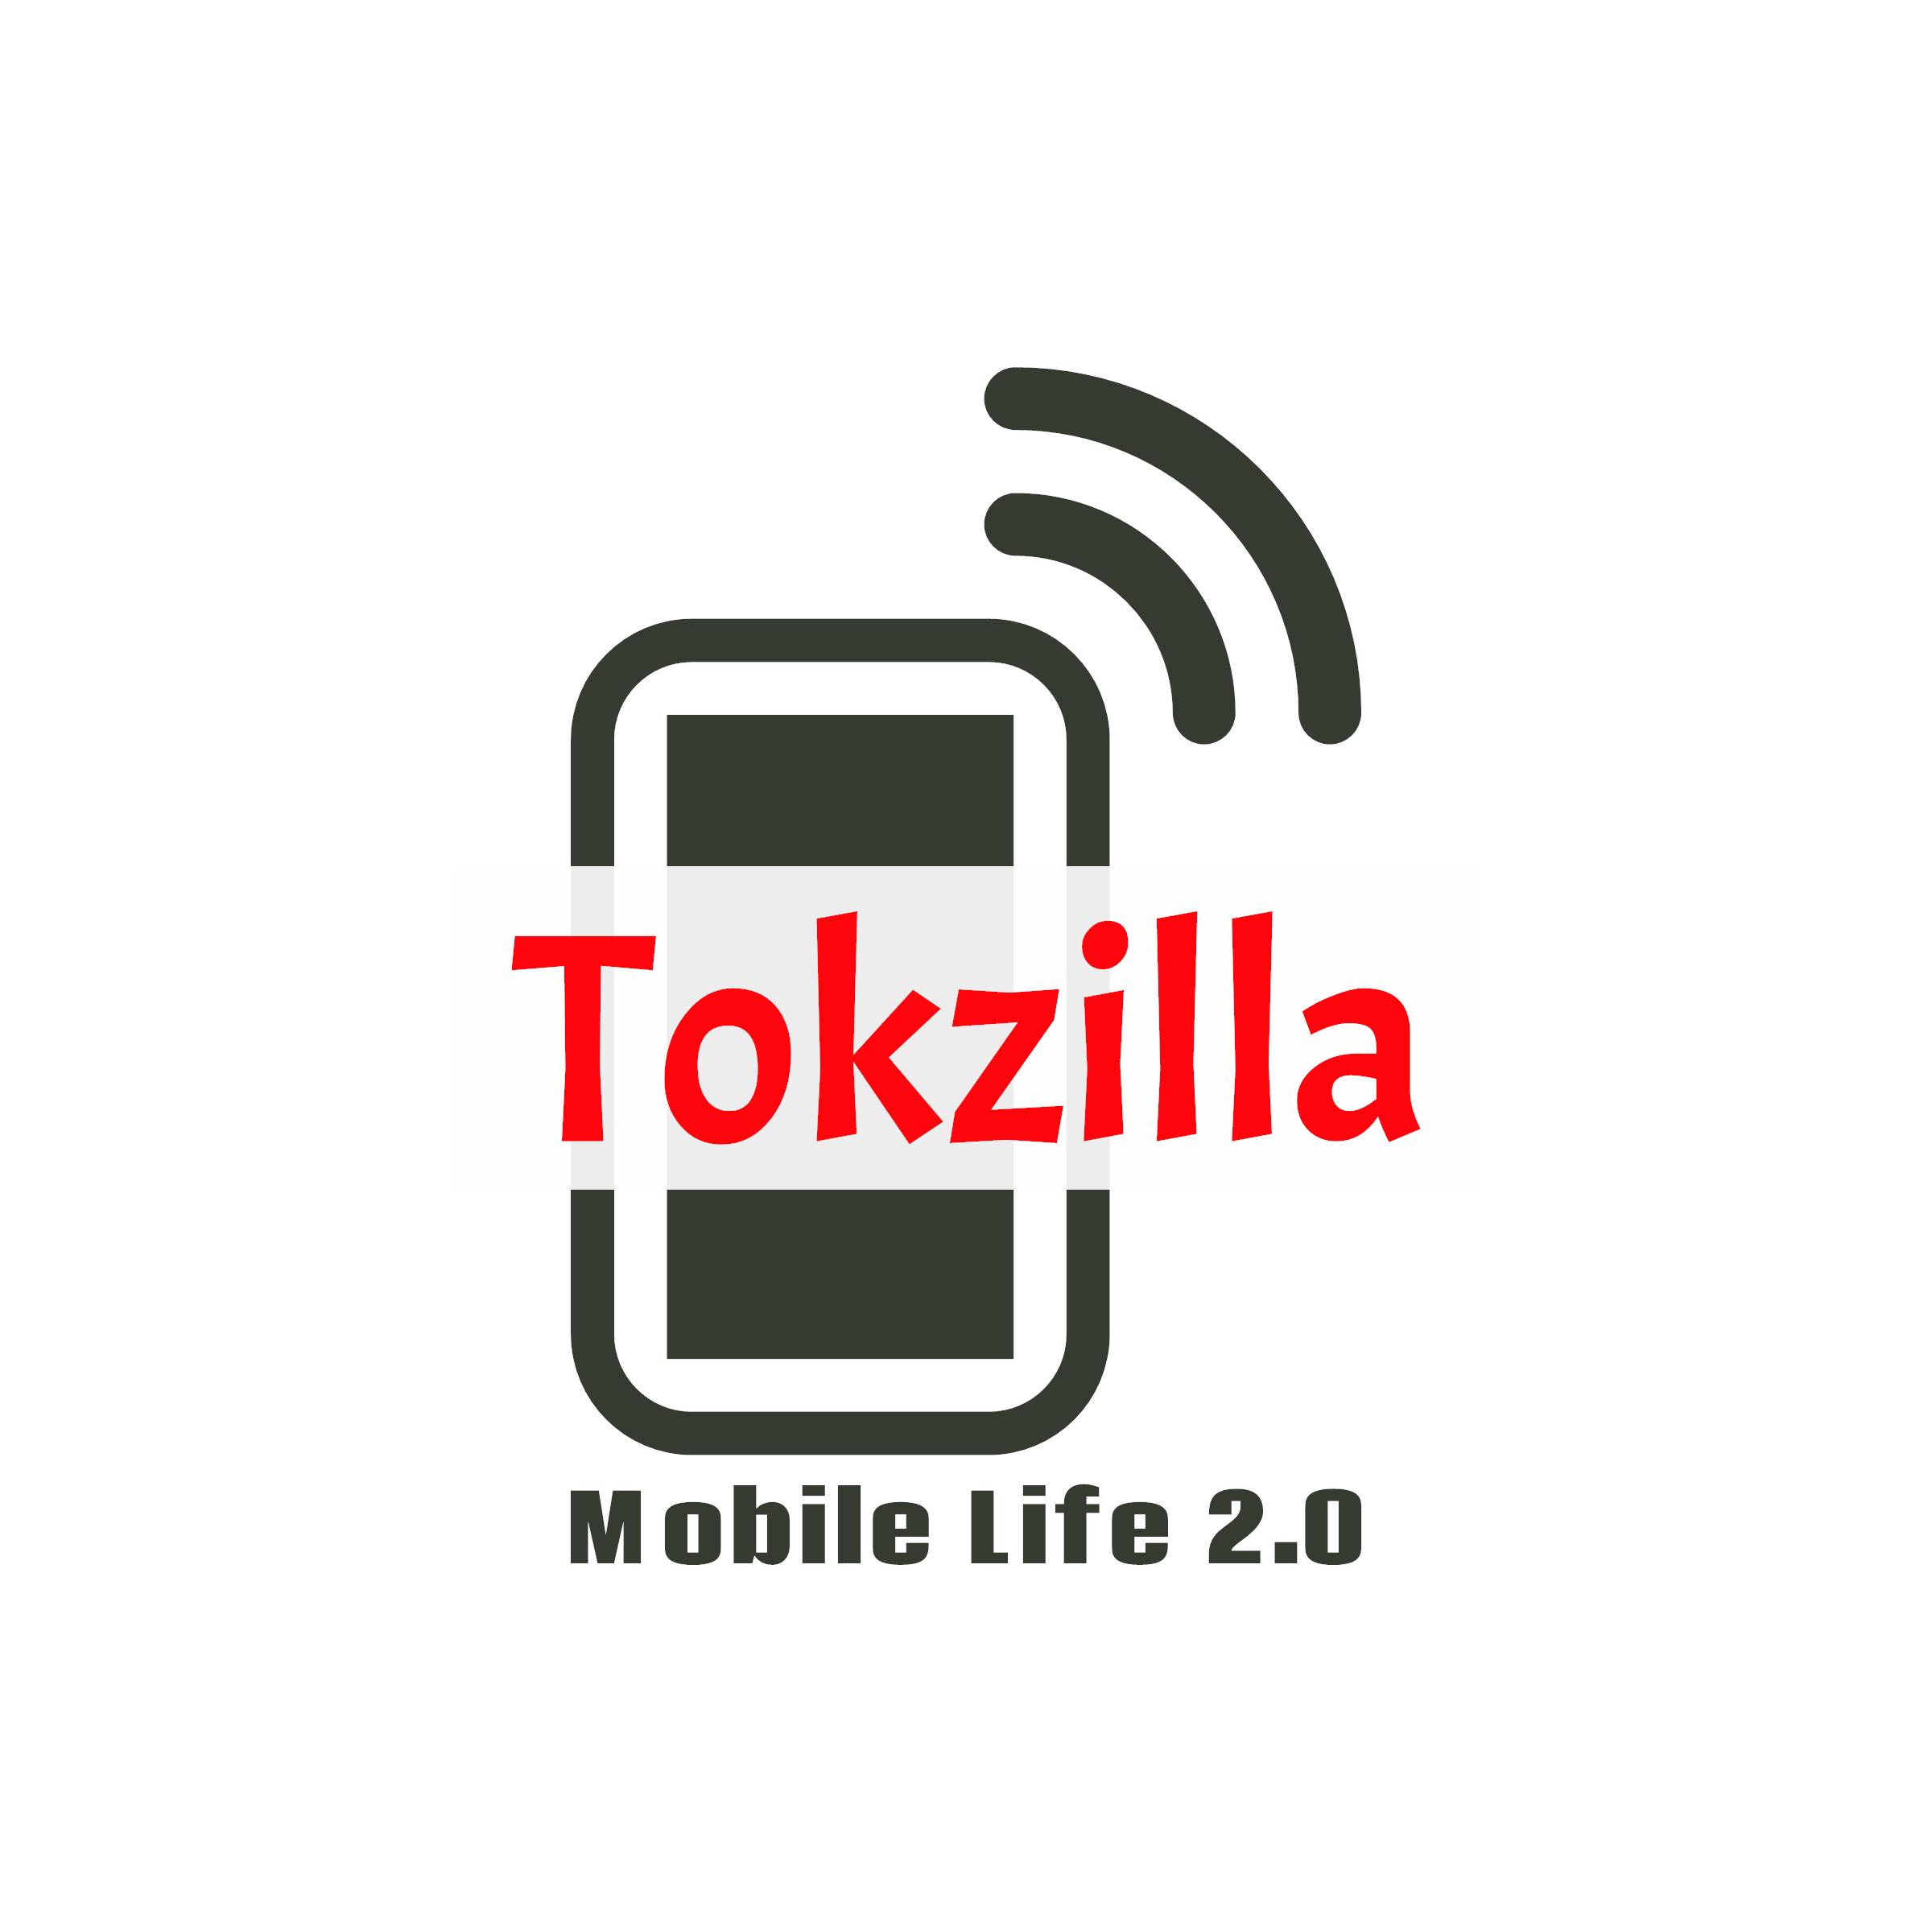 Tokzilla Mobile Life 2.0 Dein Vodafoneshop Logo